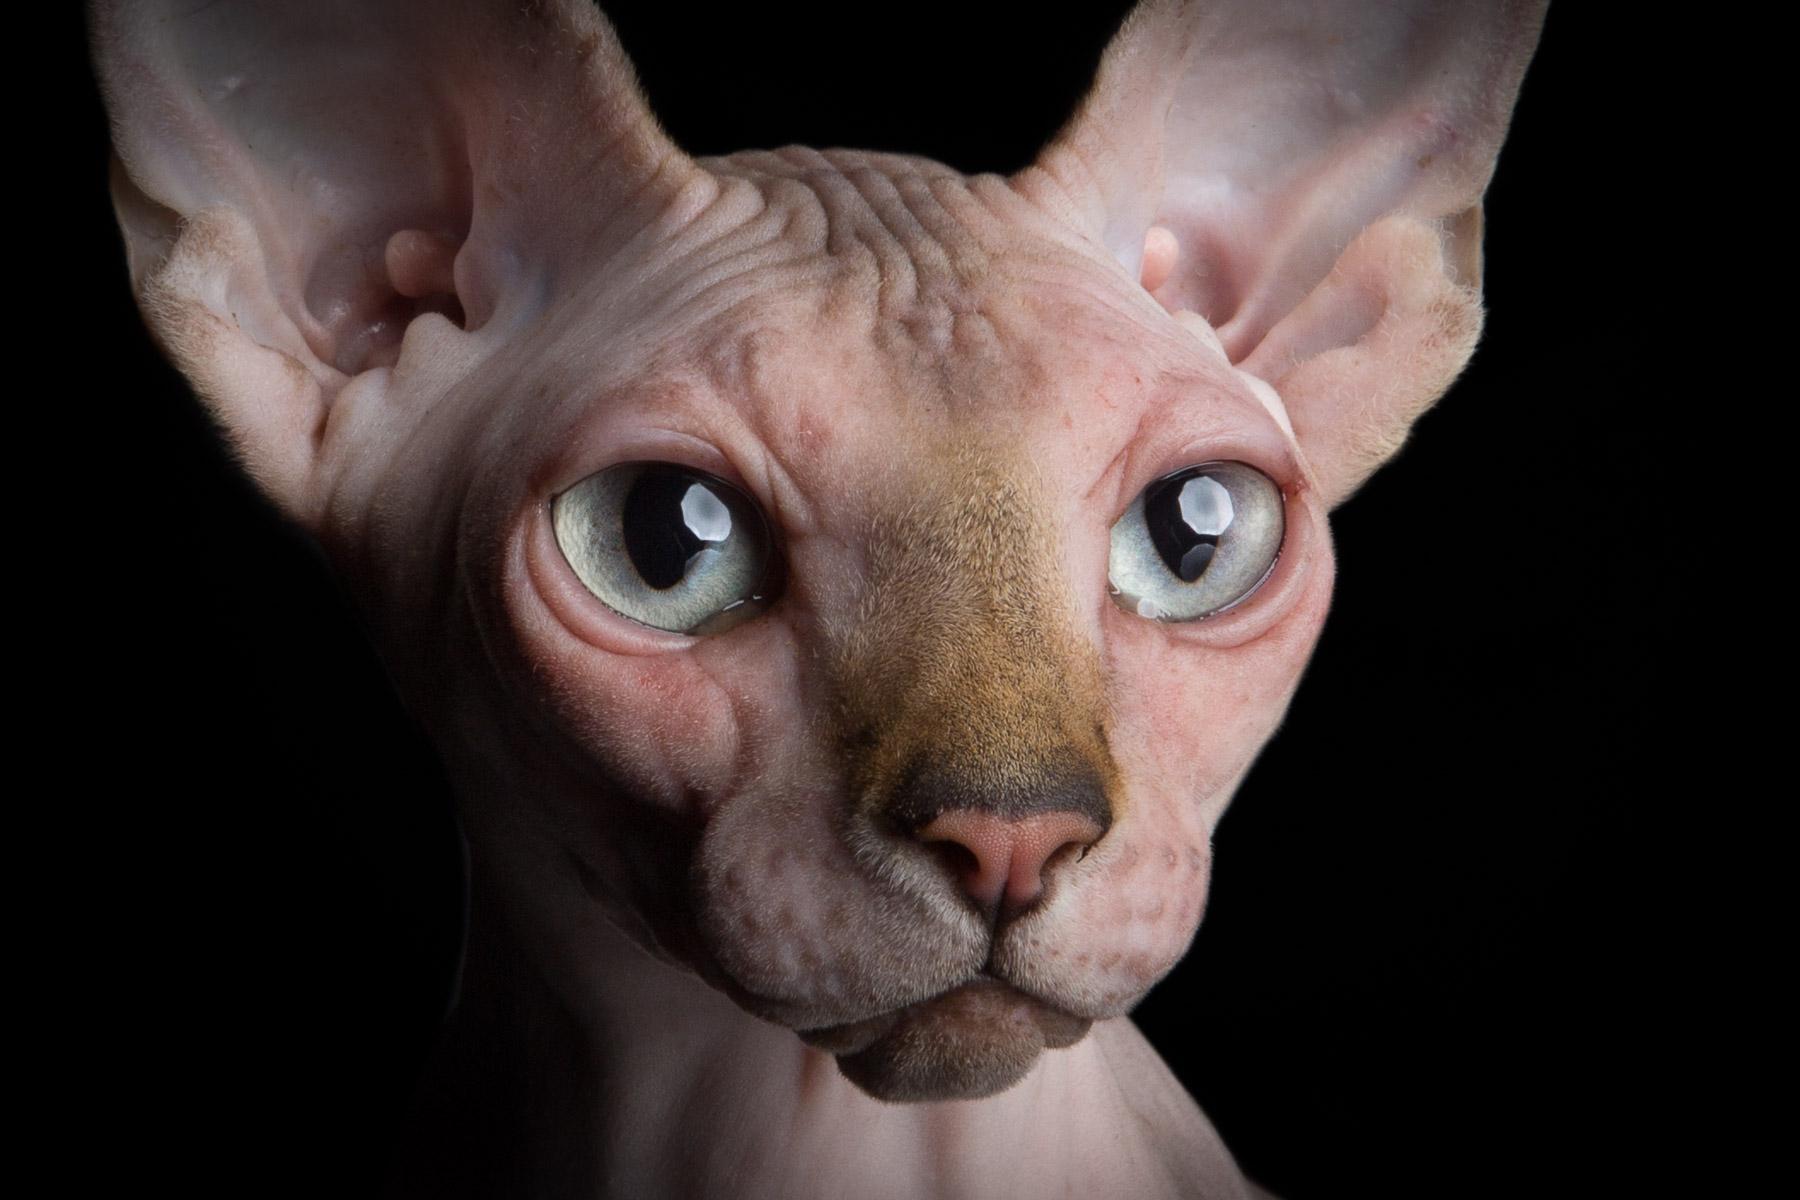 close-up-portrait-sphynx-hairless-cat-alicia-rius-animal-photographer.jpg